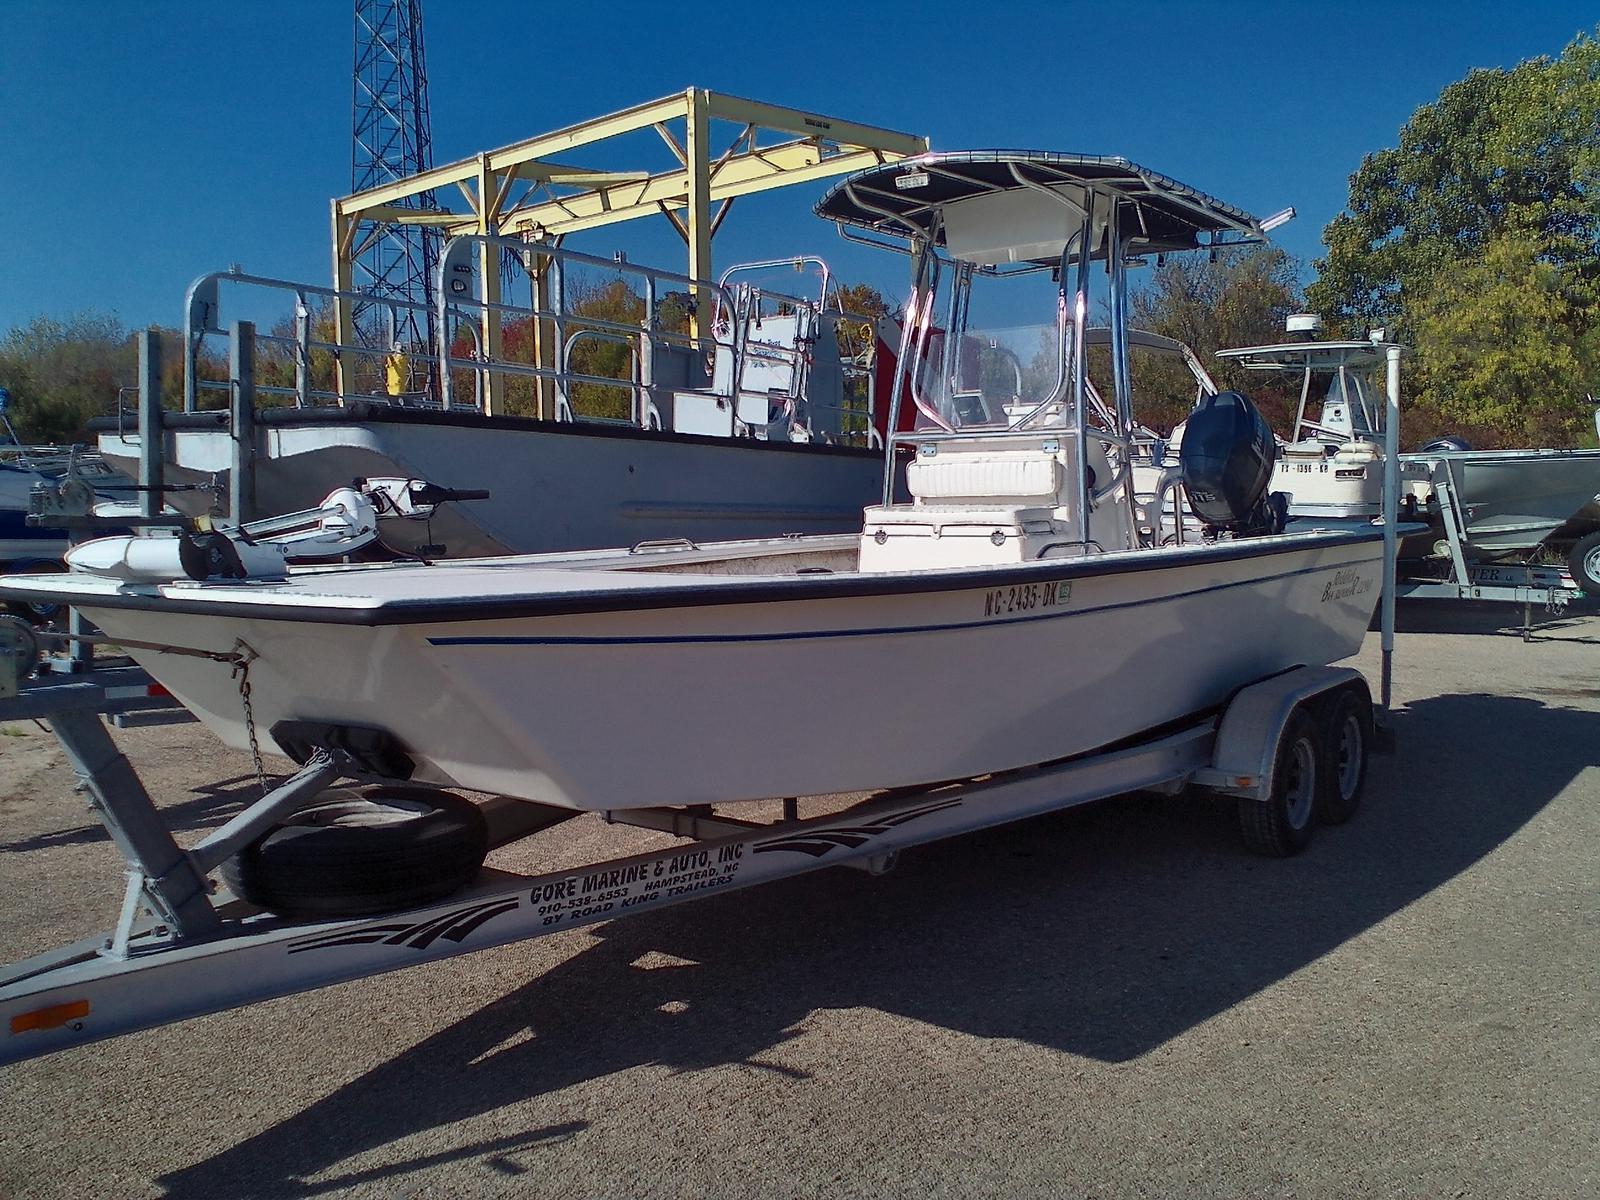 2008 Riddick boat for sale, model of the boat is Bay Runner 2290 & Image # 1 of 6